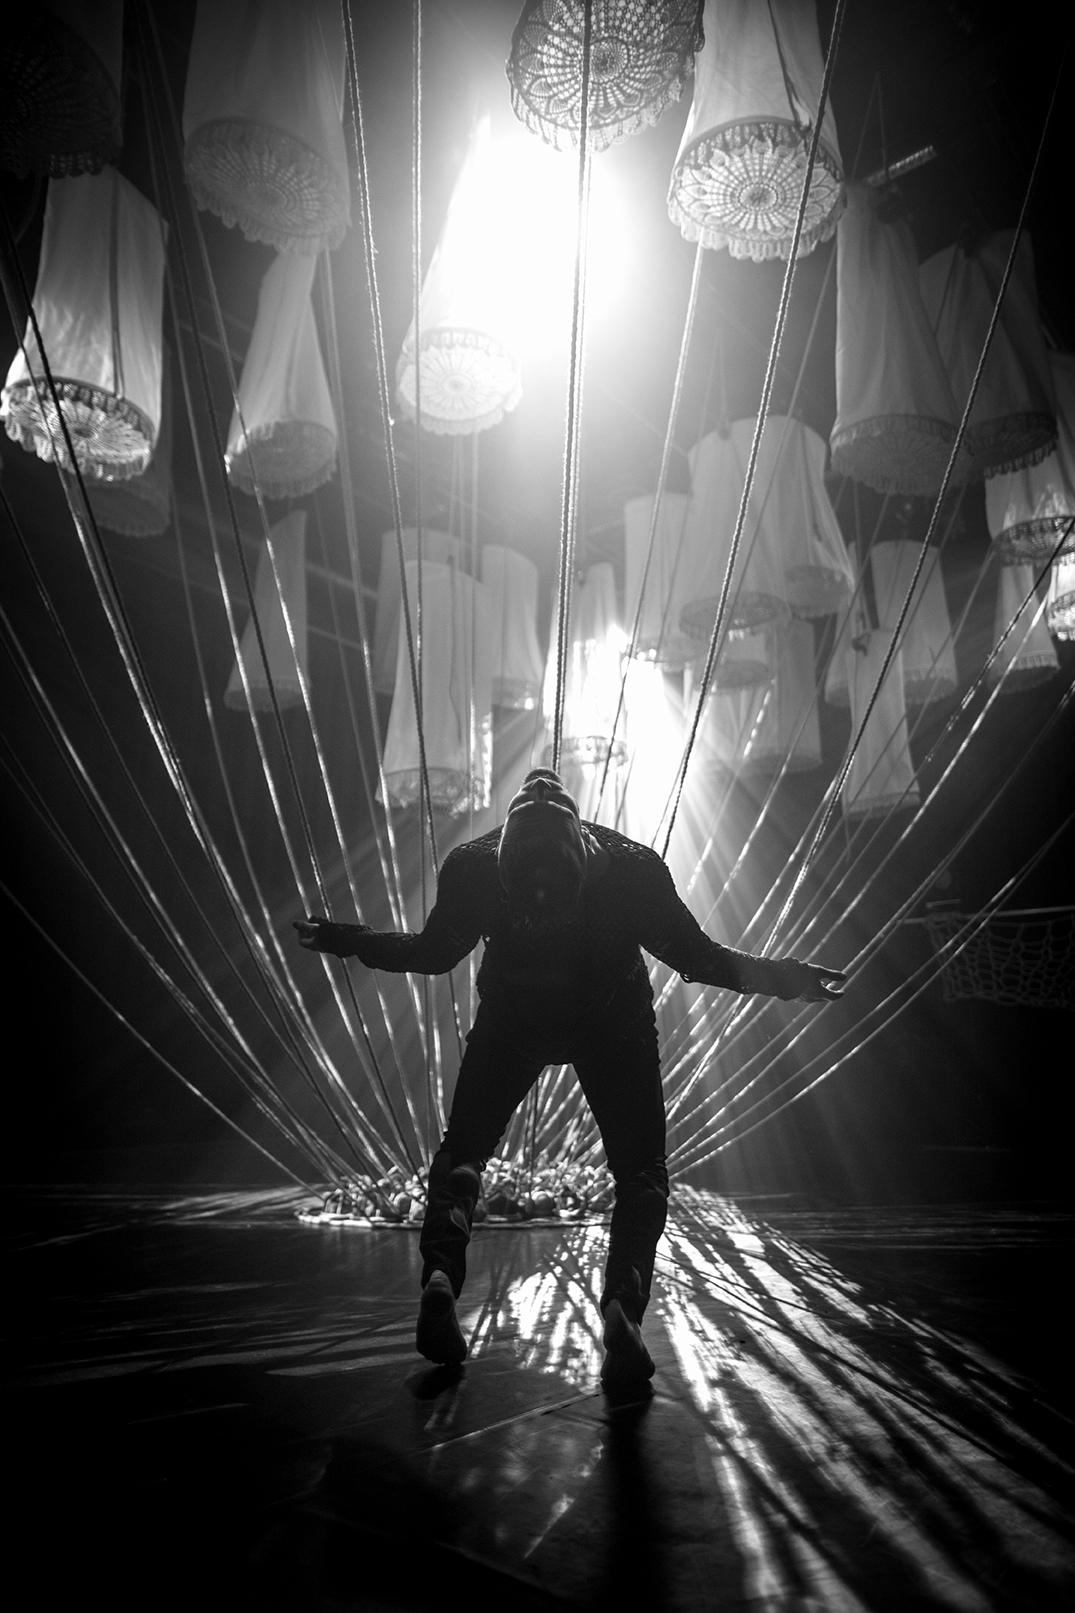 Mann danser under lanterner